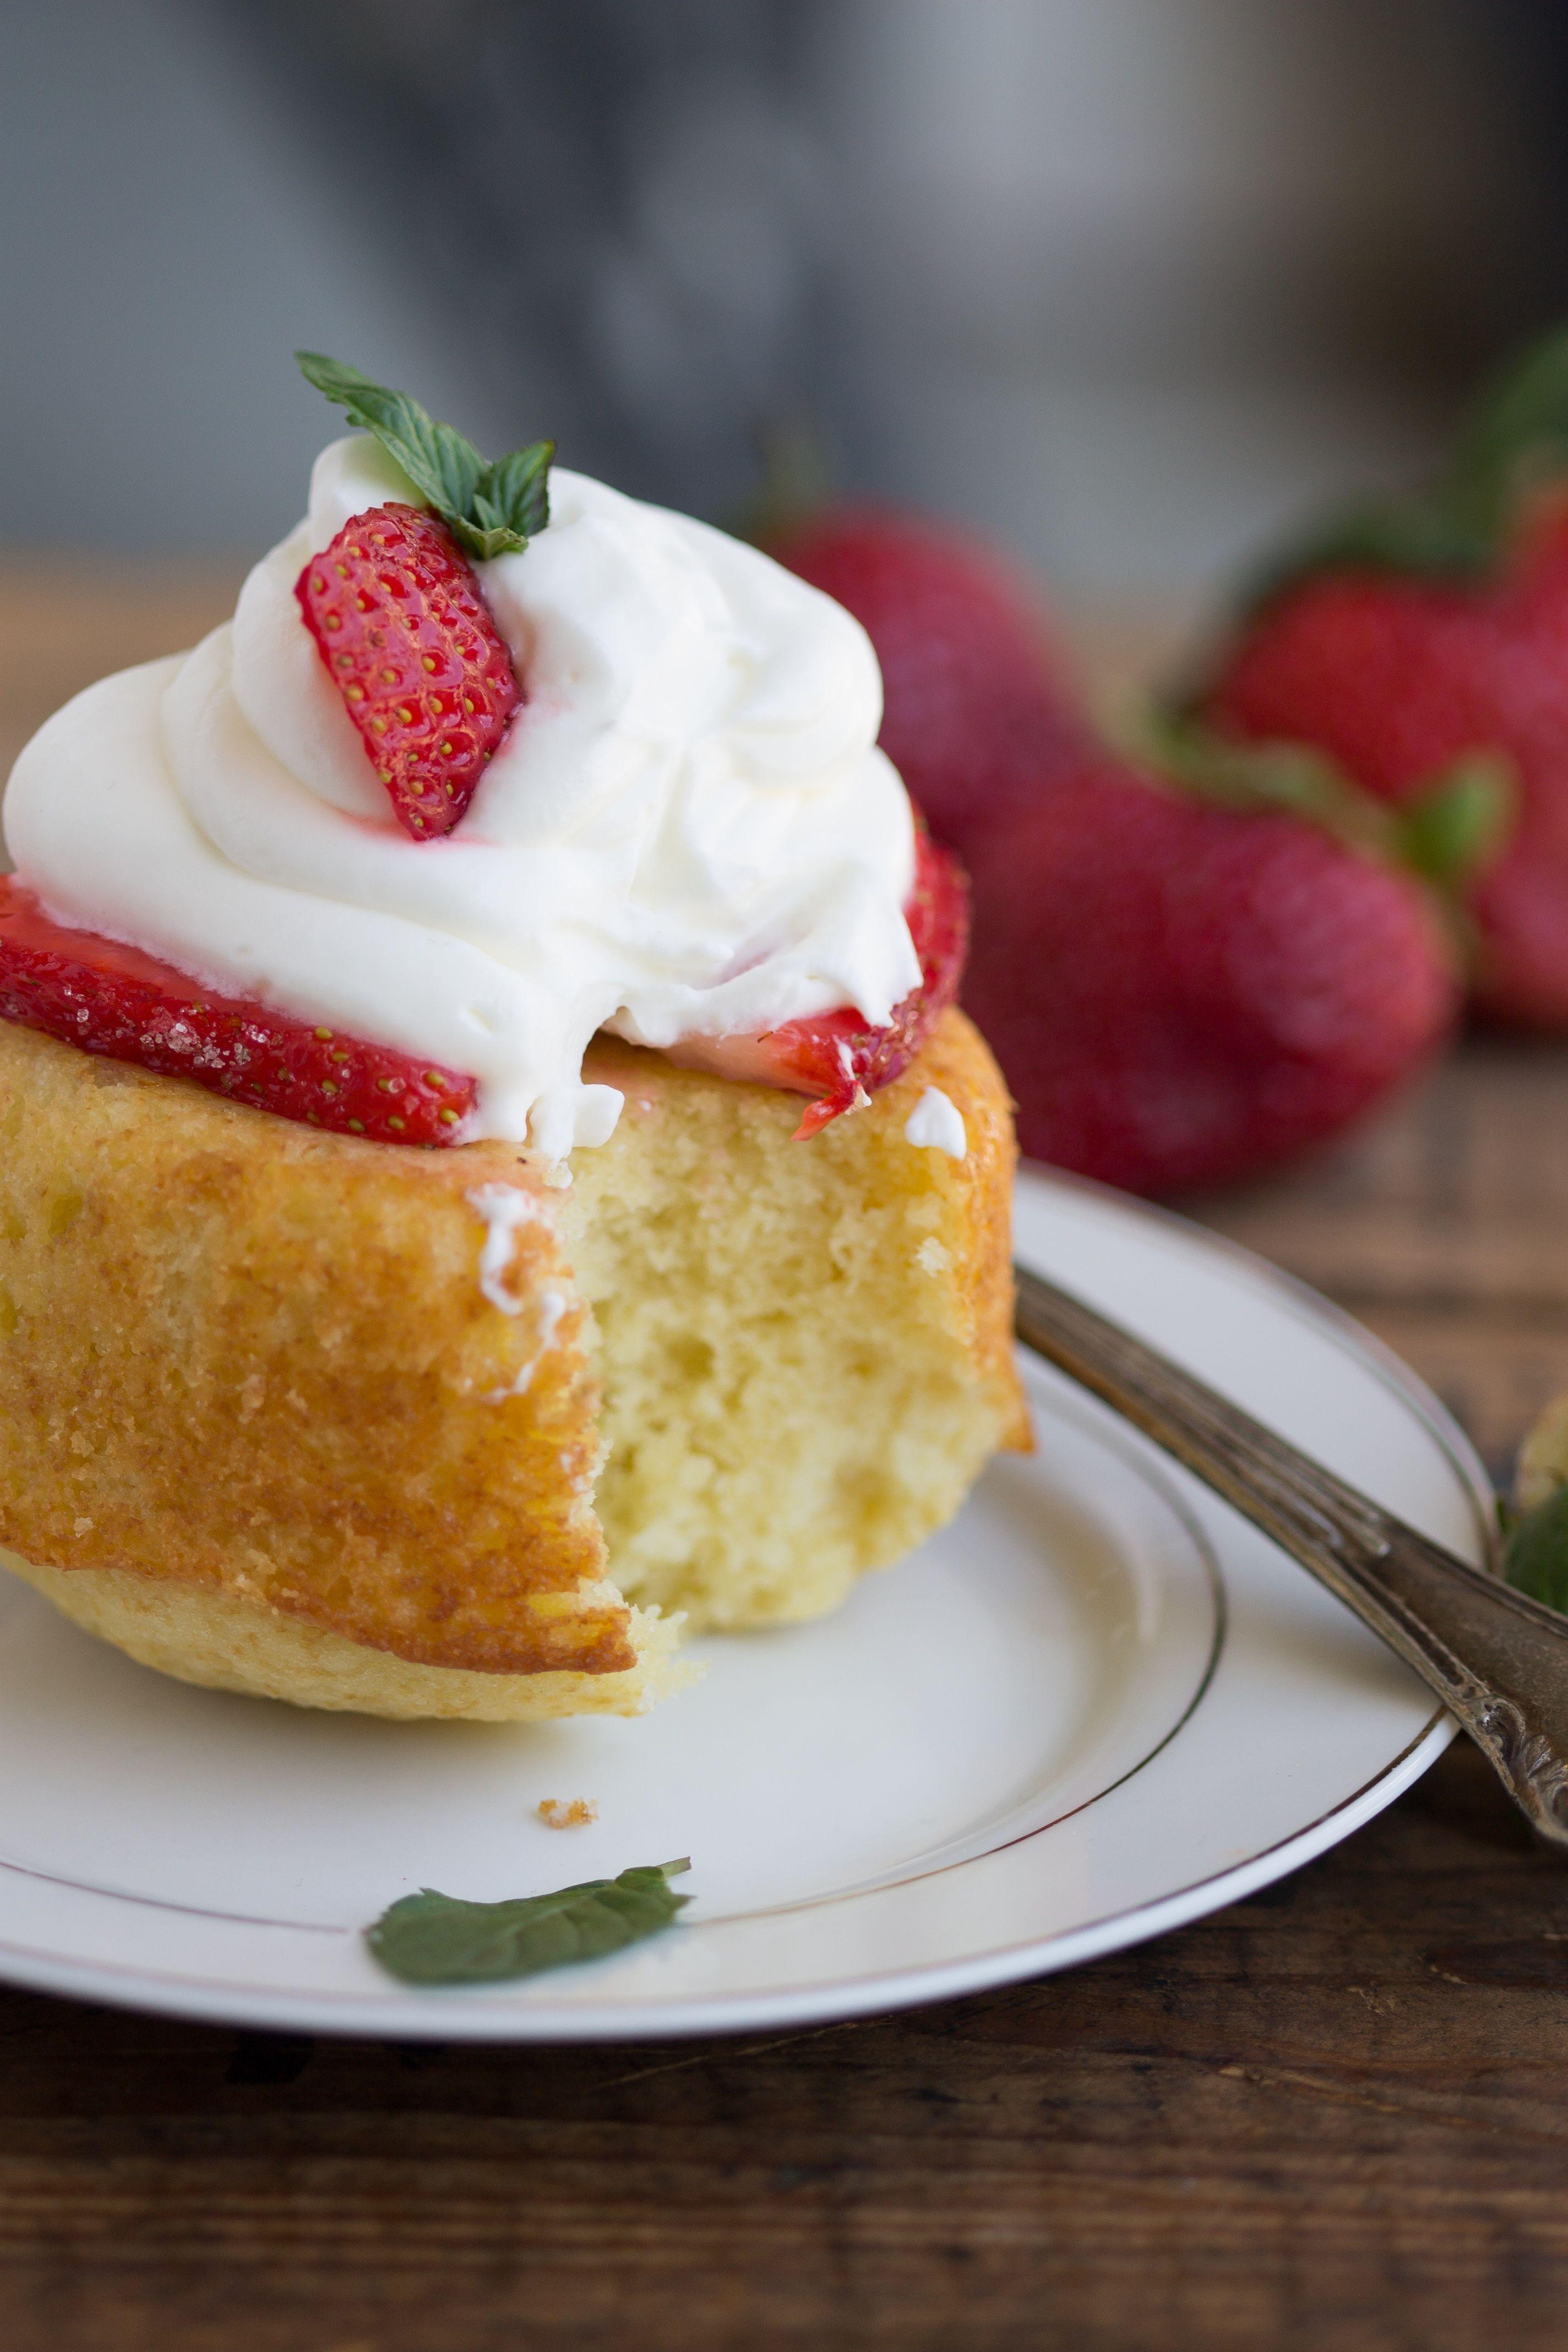 homemade strawberry shortcake